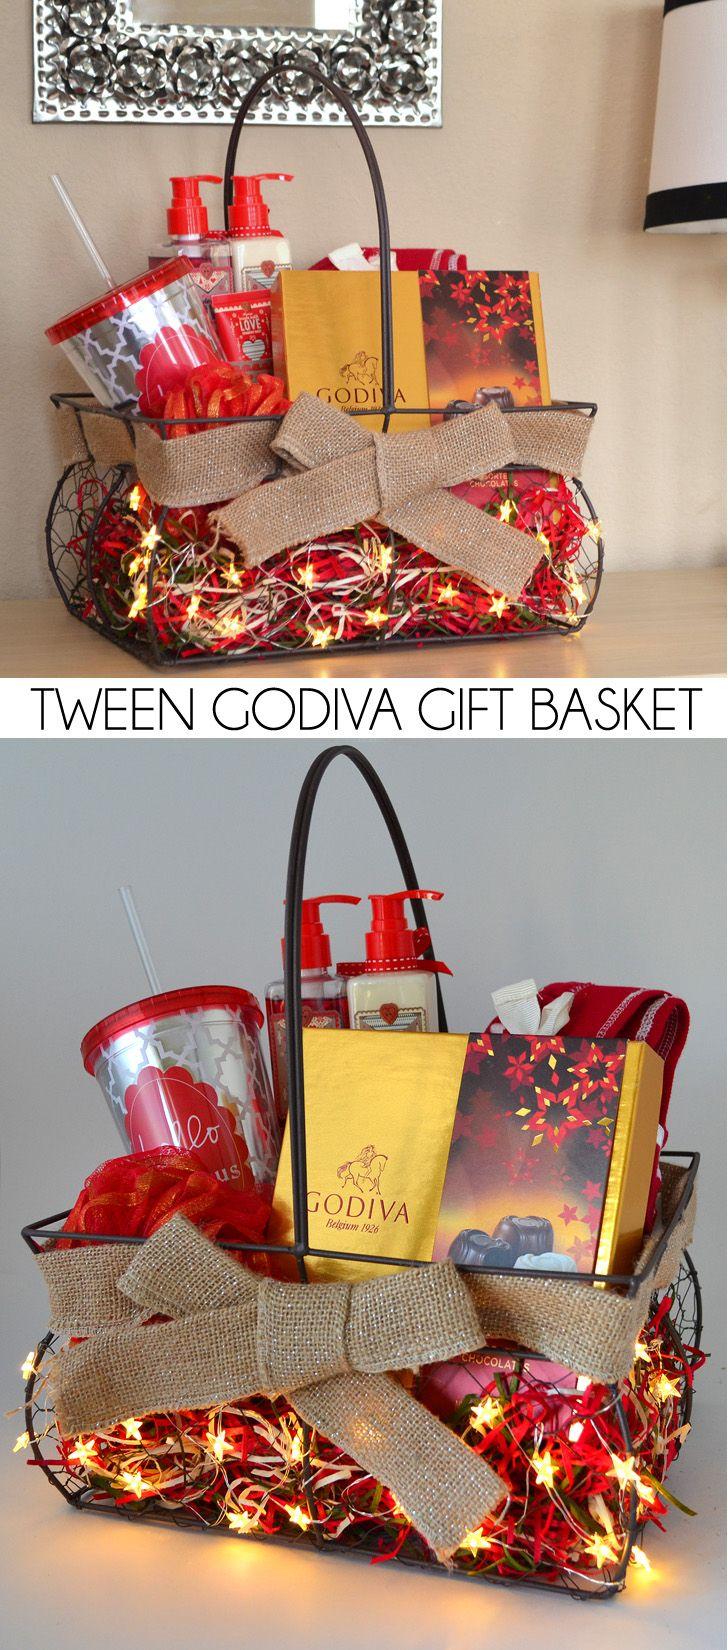 Best 25+ Gift hampers ideas on Pinterest | Hamper ideas, Present ...